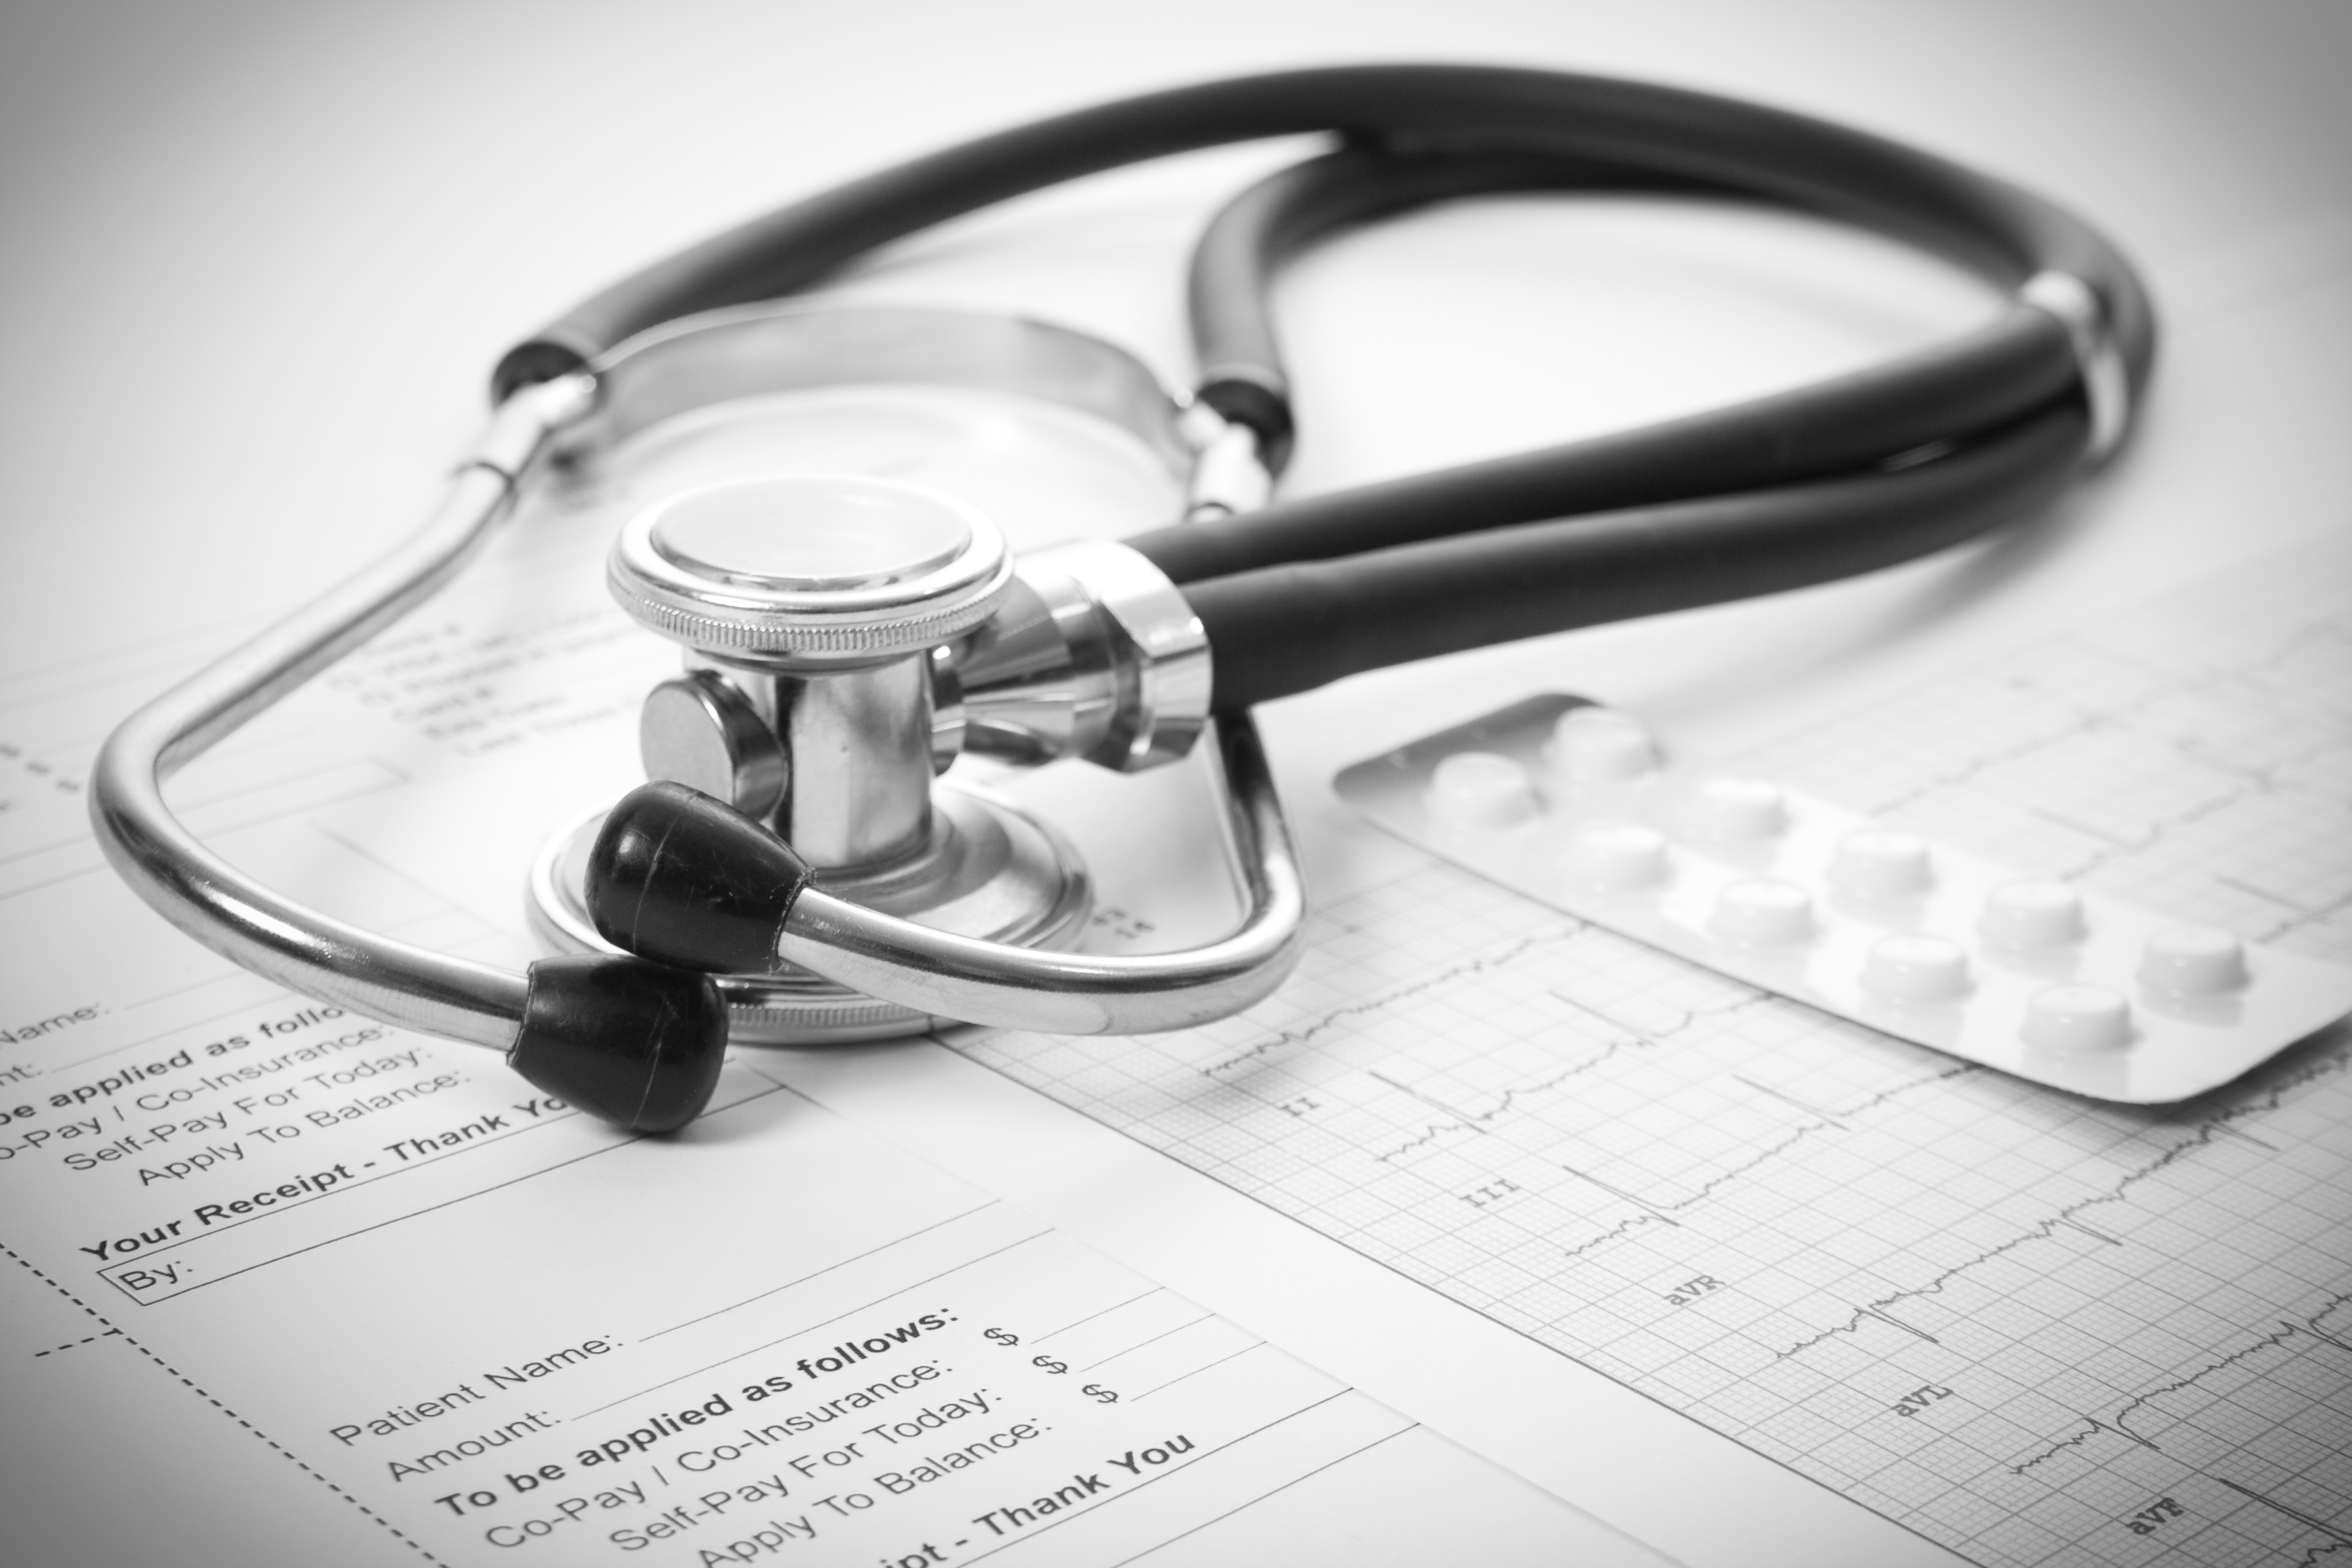 Sthetoscope, EKG and pills